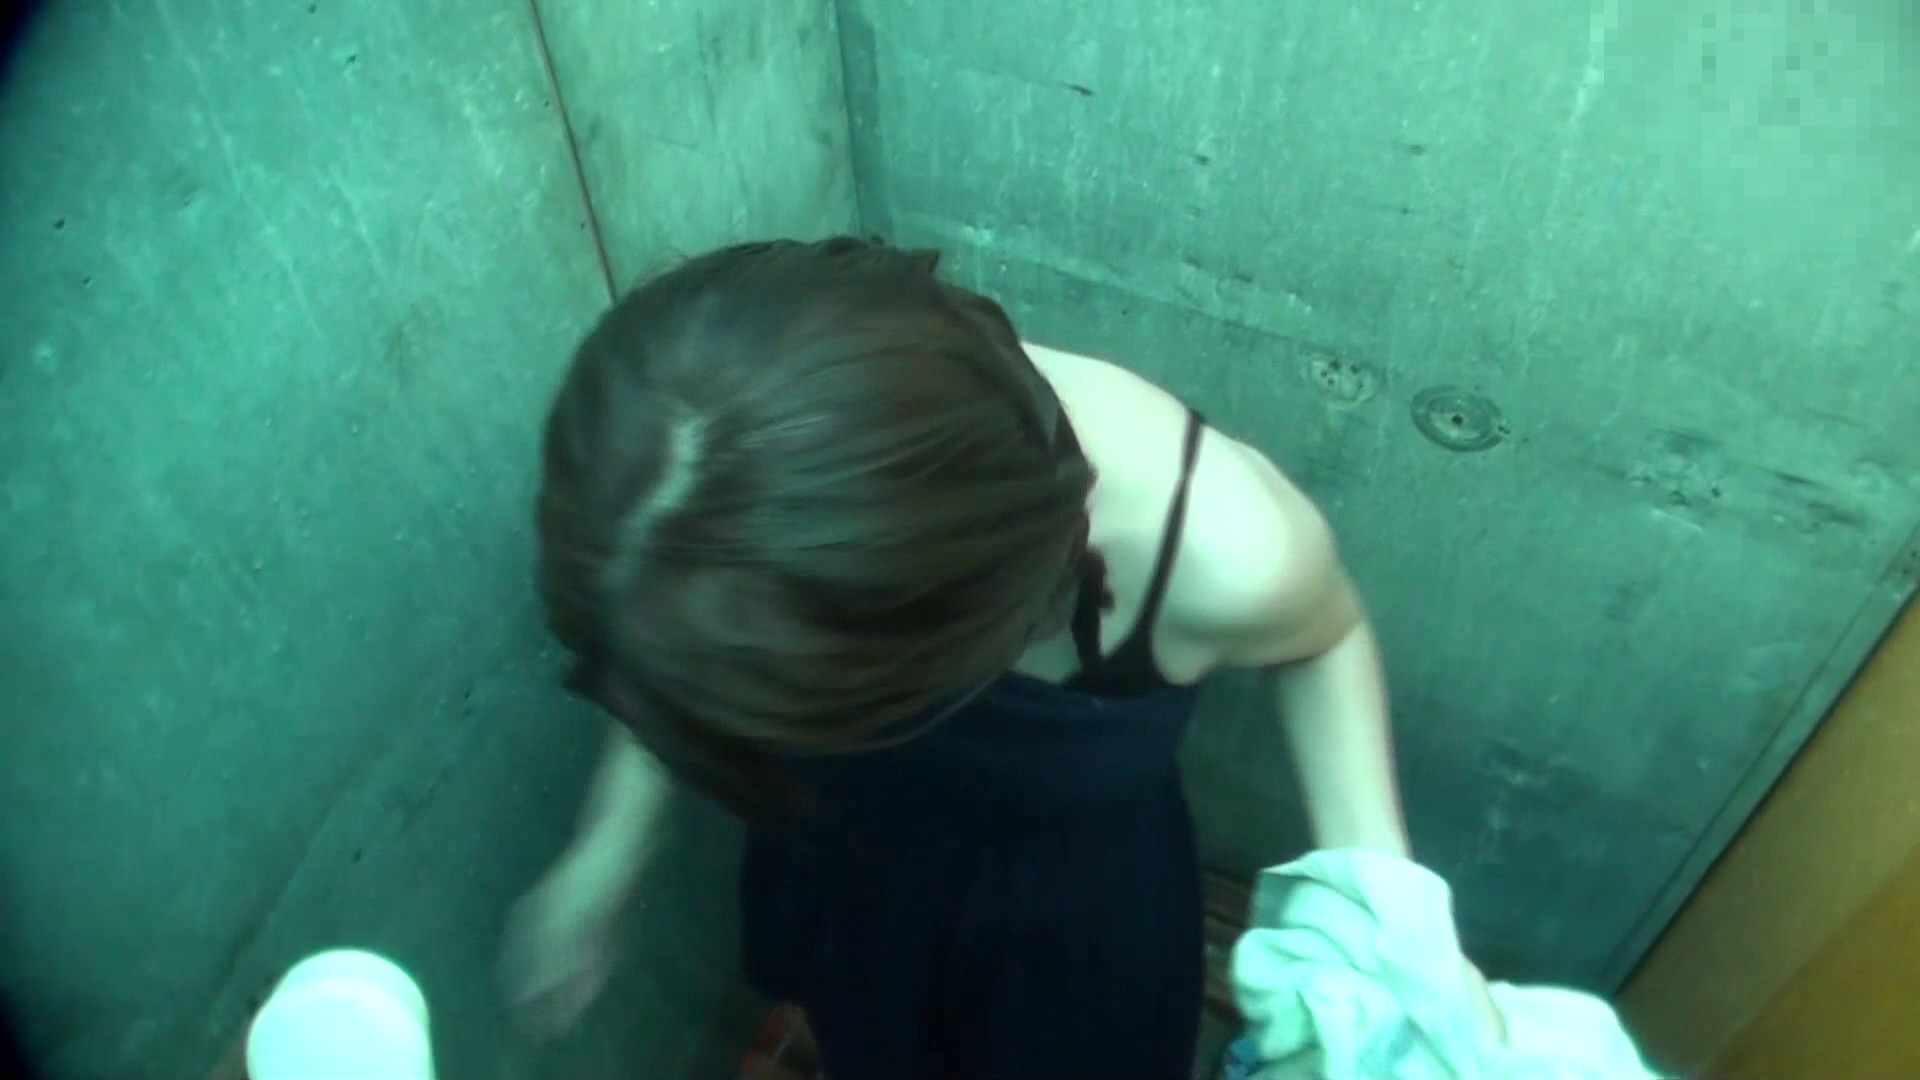 Vol.12 女性の性器には予想外の砂が混入しているようです。 シャワー中 | 高画質  96連発 20